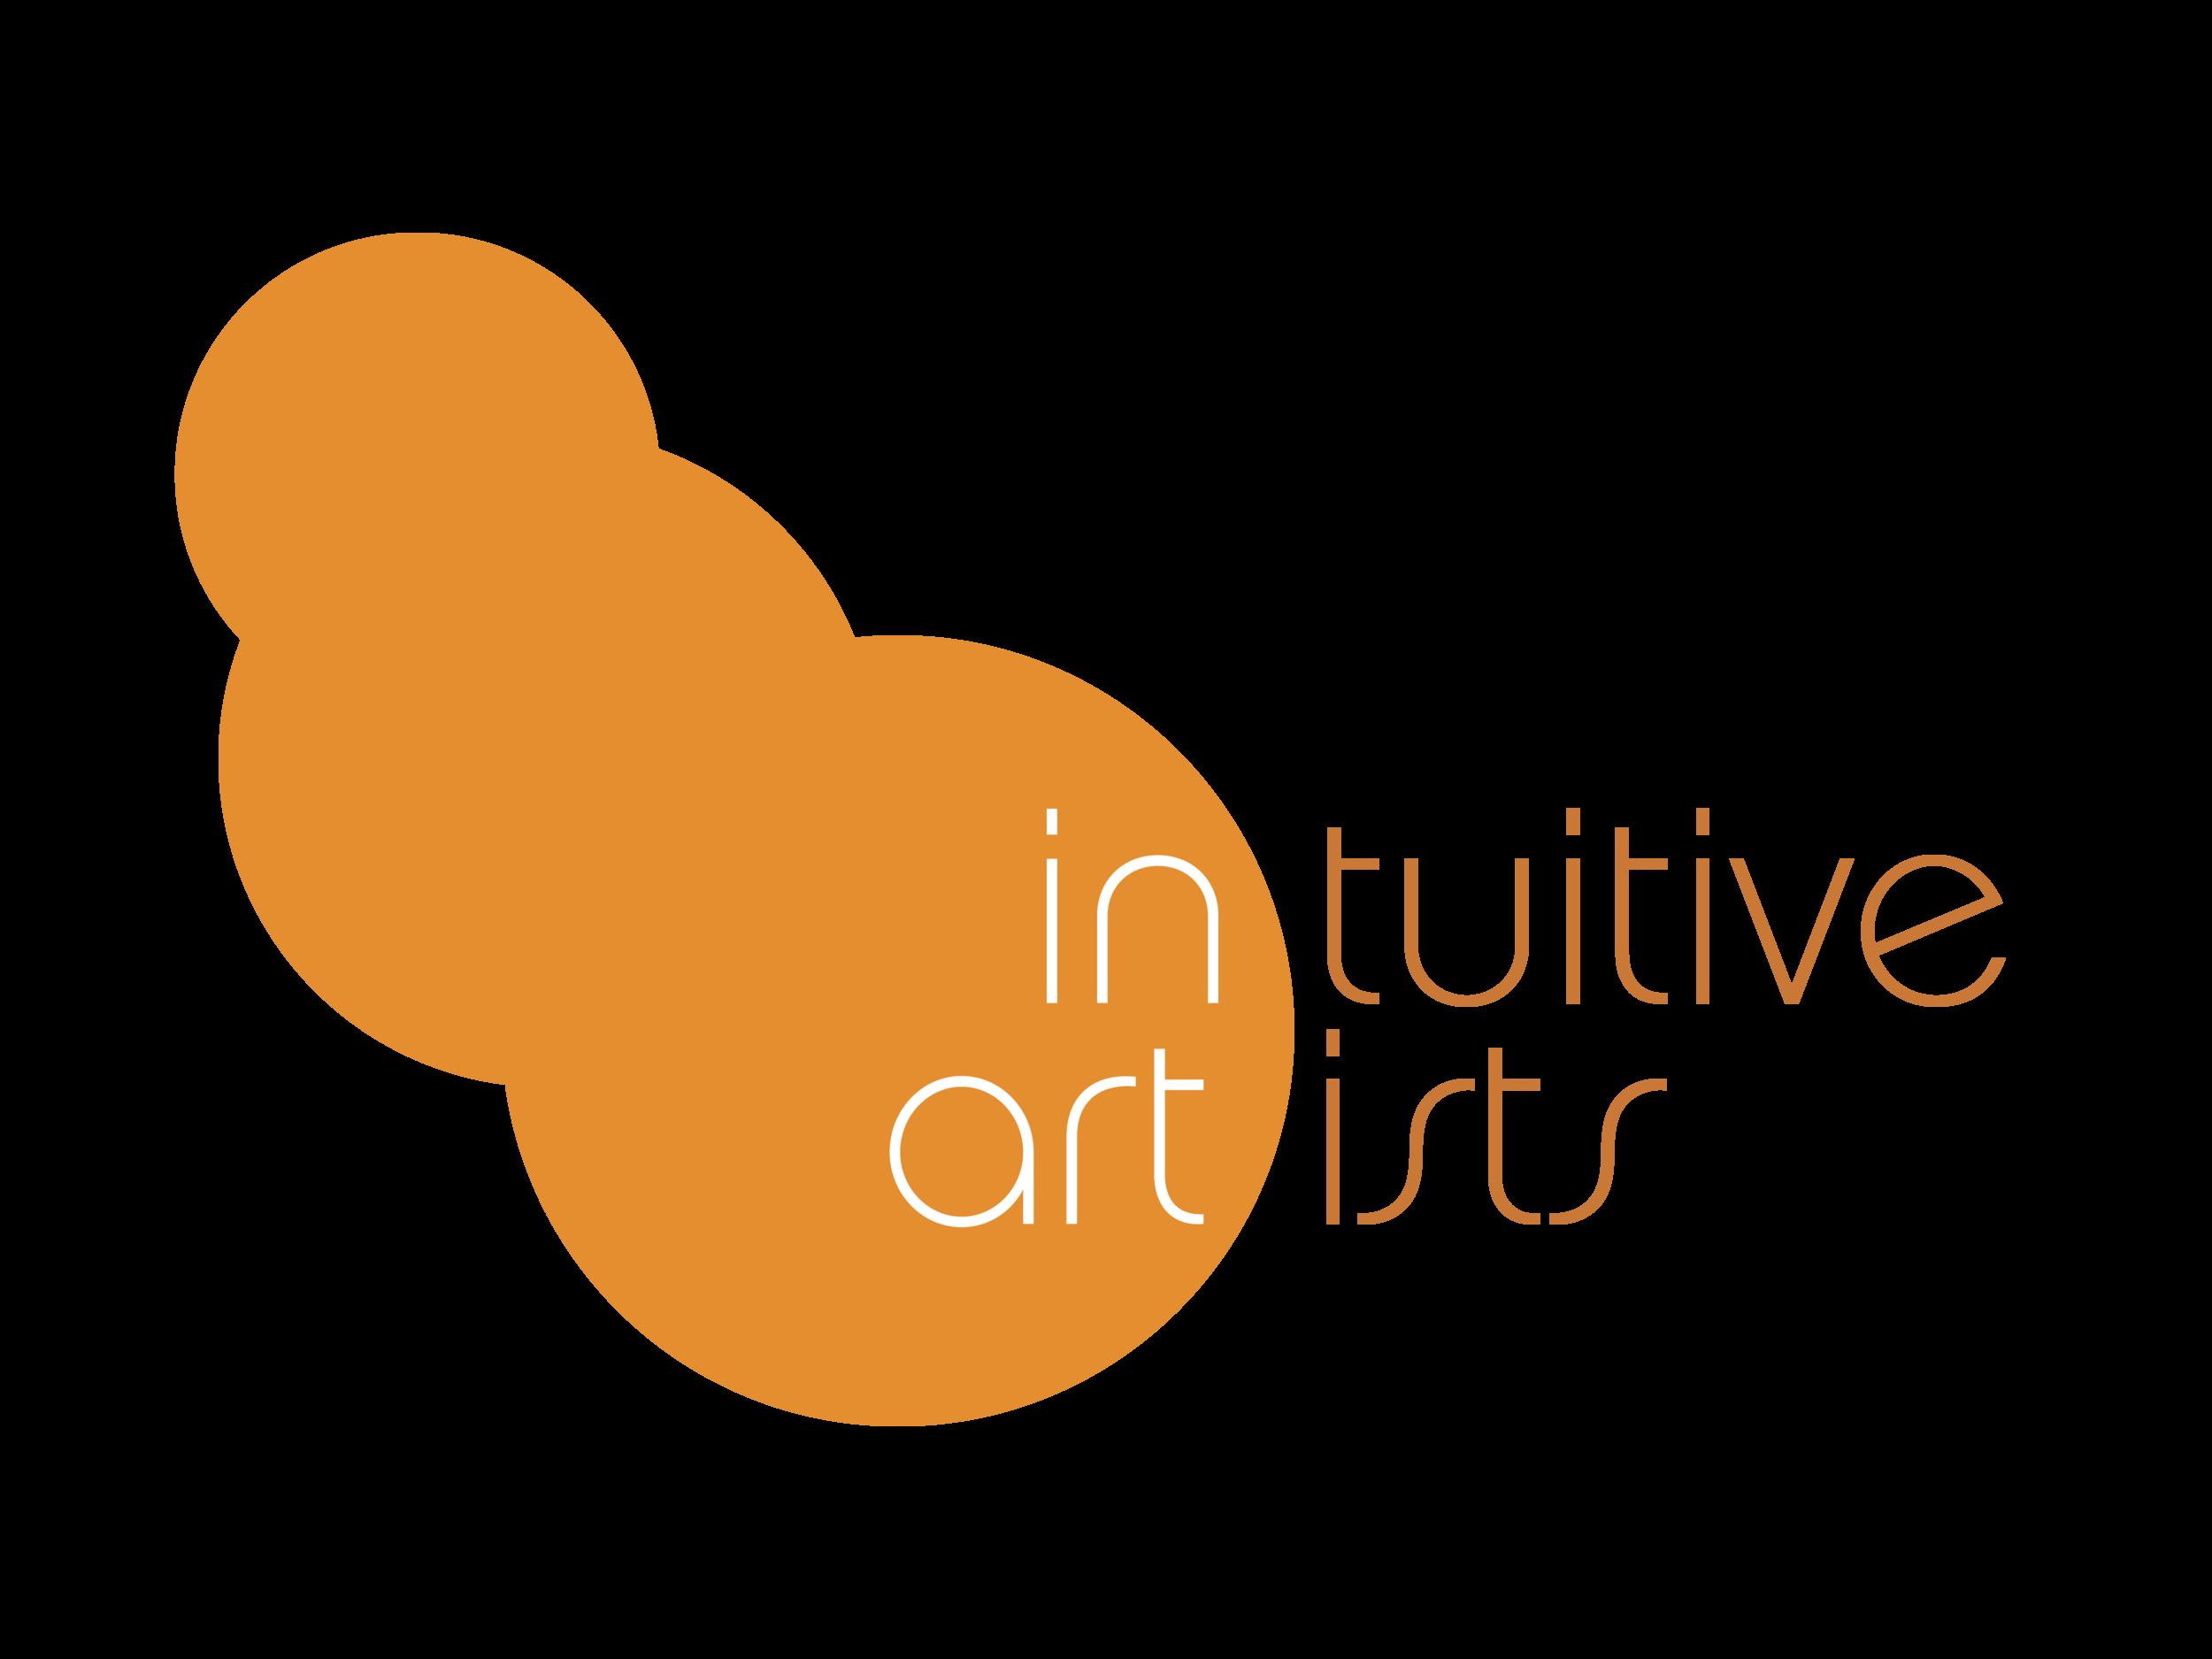 ia-logo-orange-trans.png